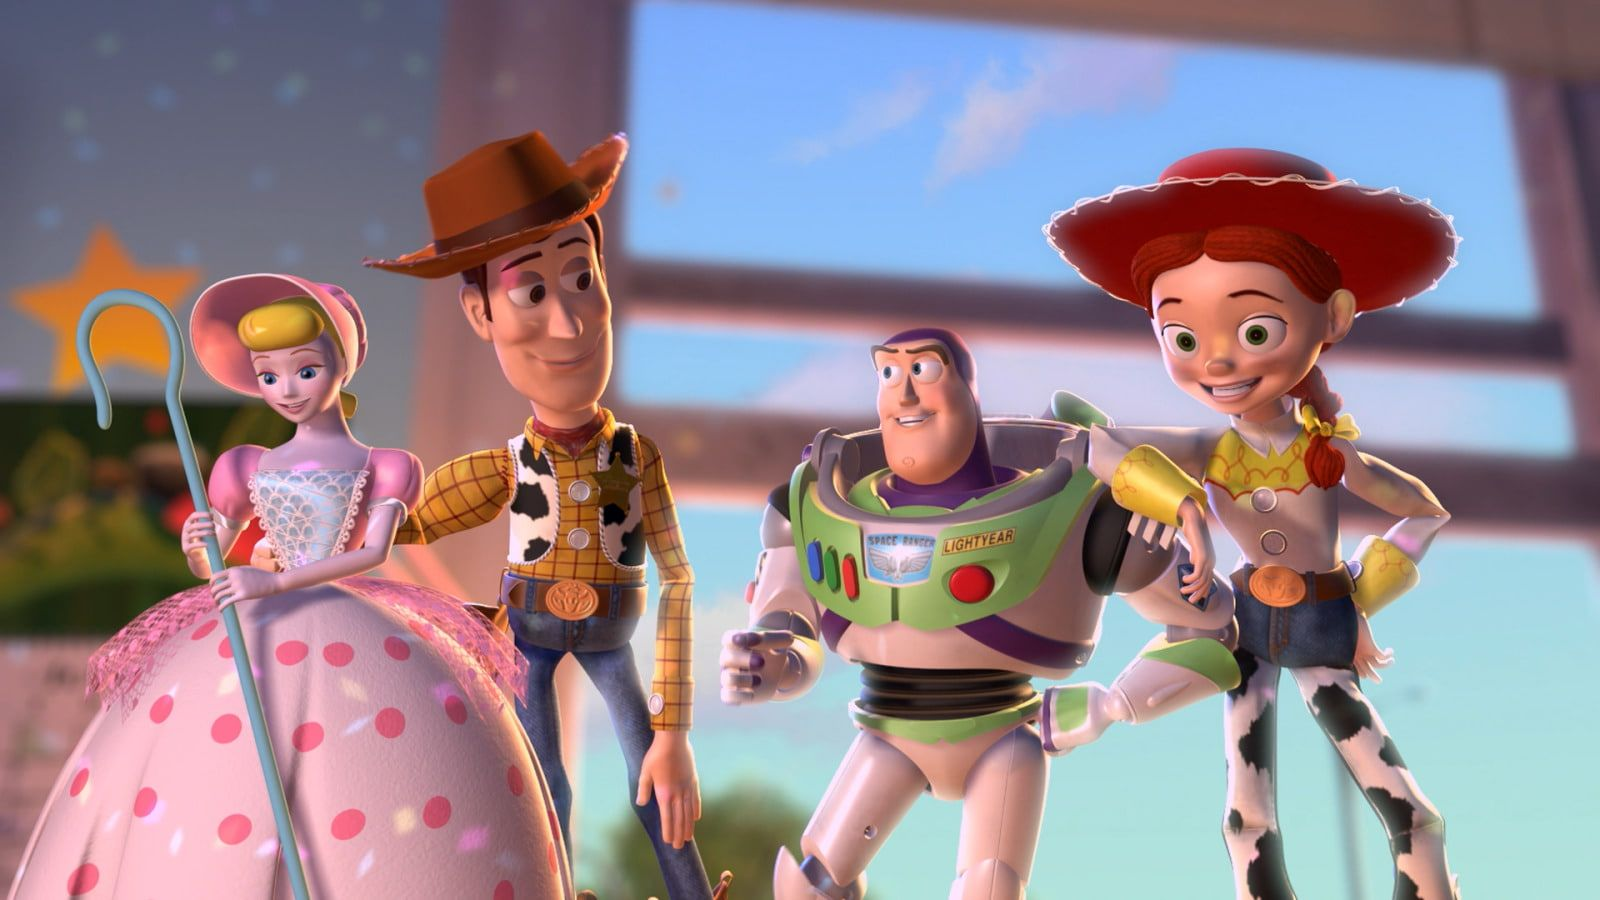 Toy Story Bo Peep Buzz Lightyear Jessie Toy Story Woody Toy Story 720p Wallpaper Hdwallpaper Desktop Jessie Toy Story Jessie Doll Woody Toy Story